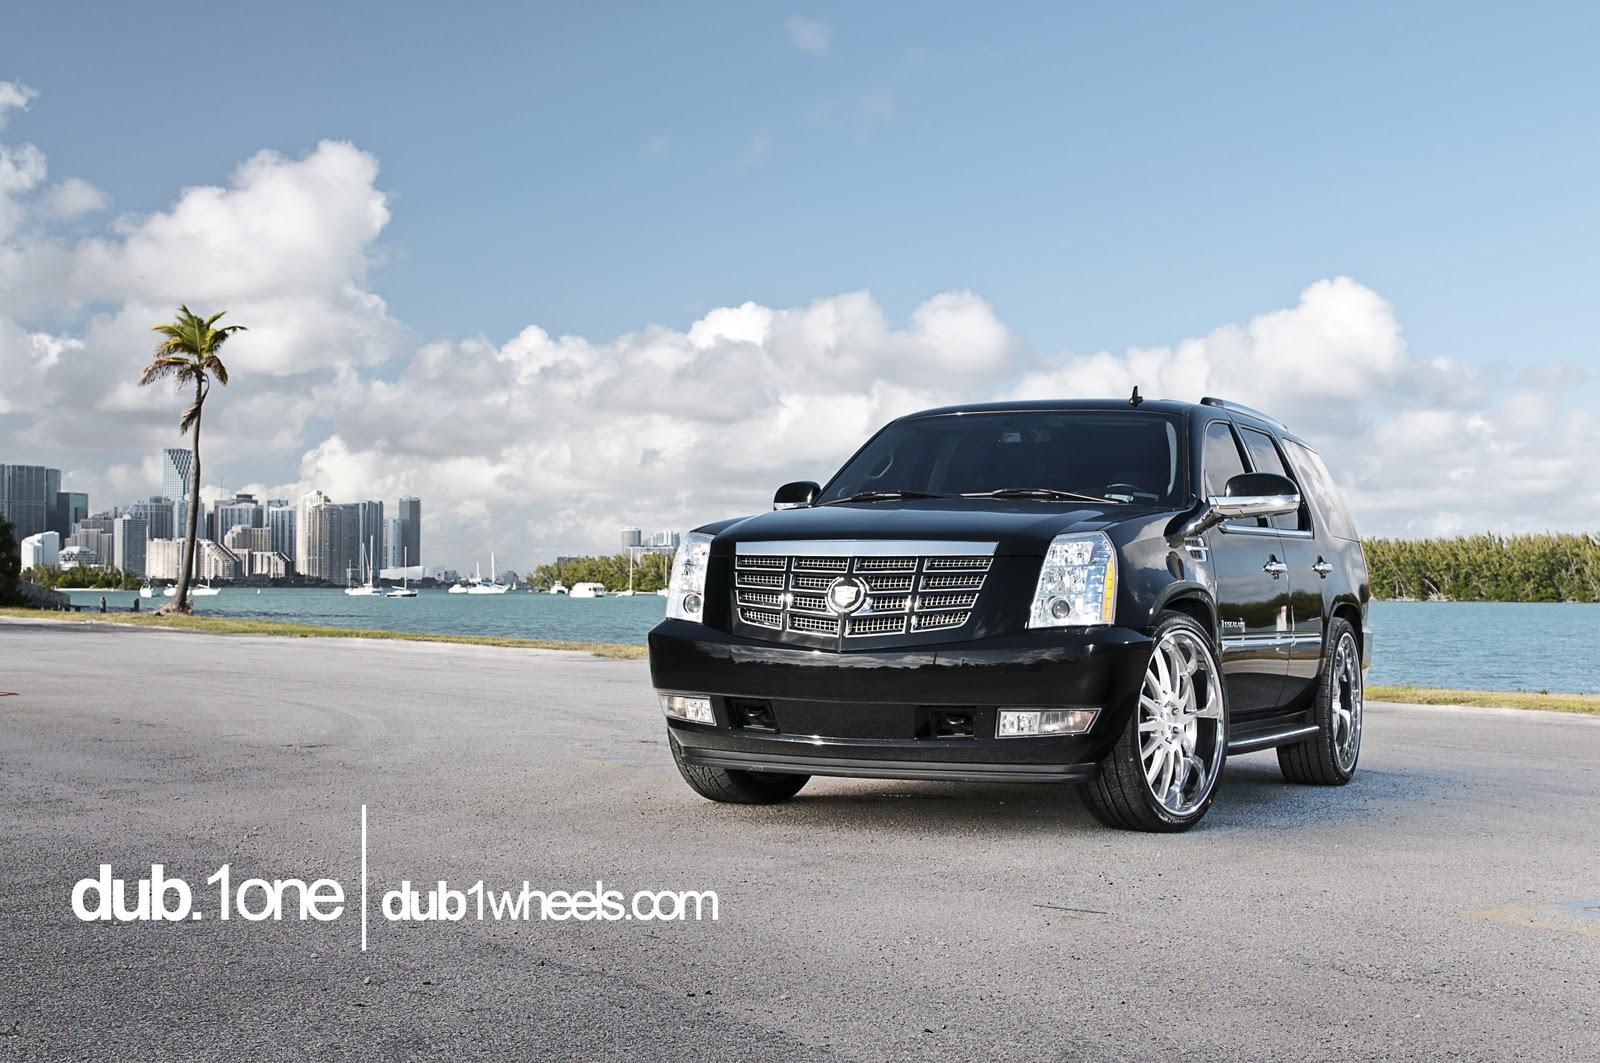 http://2.bp.blogspot.com/_v5h2qxDB1io/TTv4xvDFNqI/AAAAAAAABgs/Hj7cHvm5g4M/s1600/Cadillac+Escalade.jpg